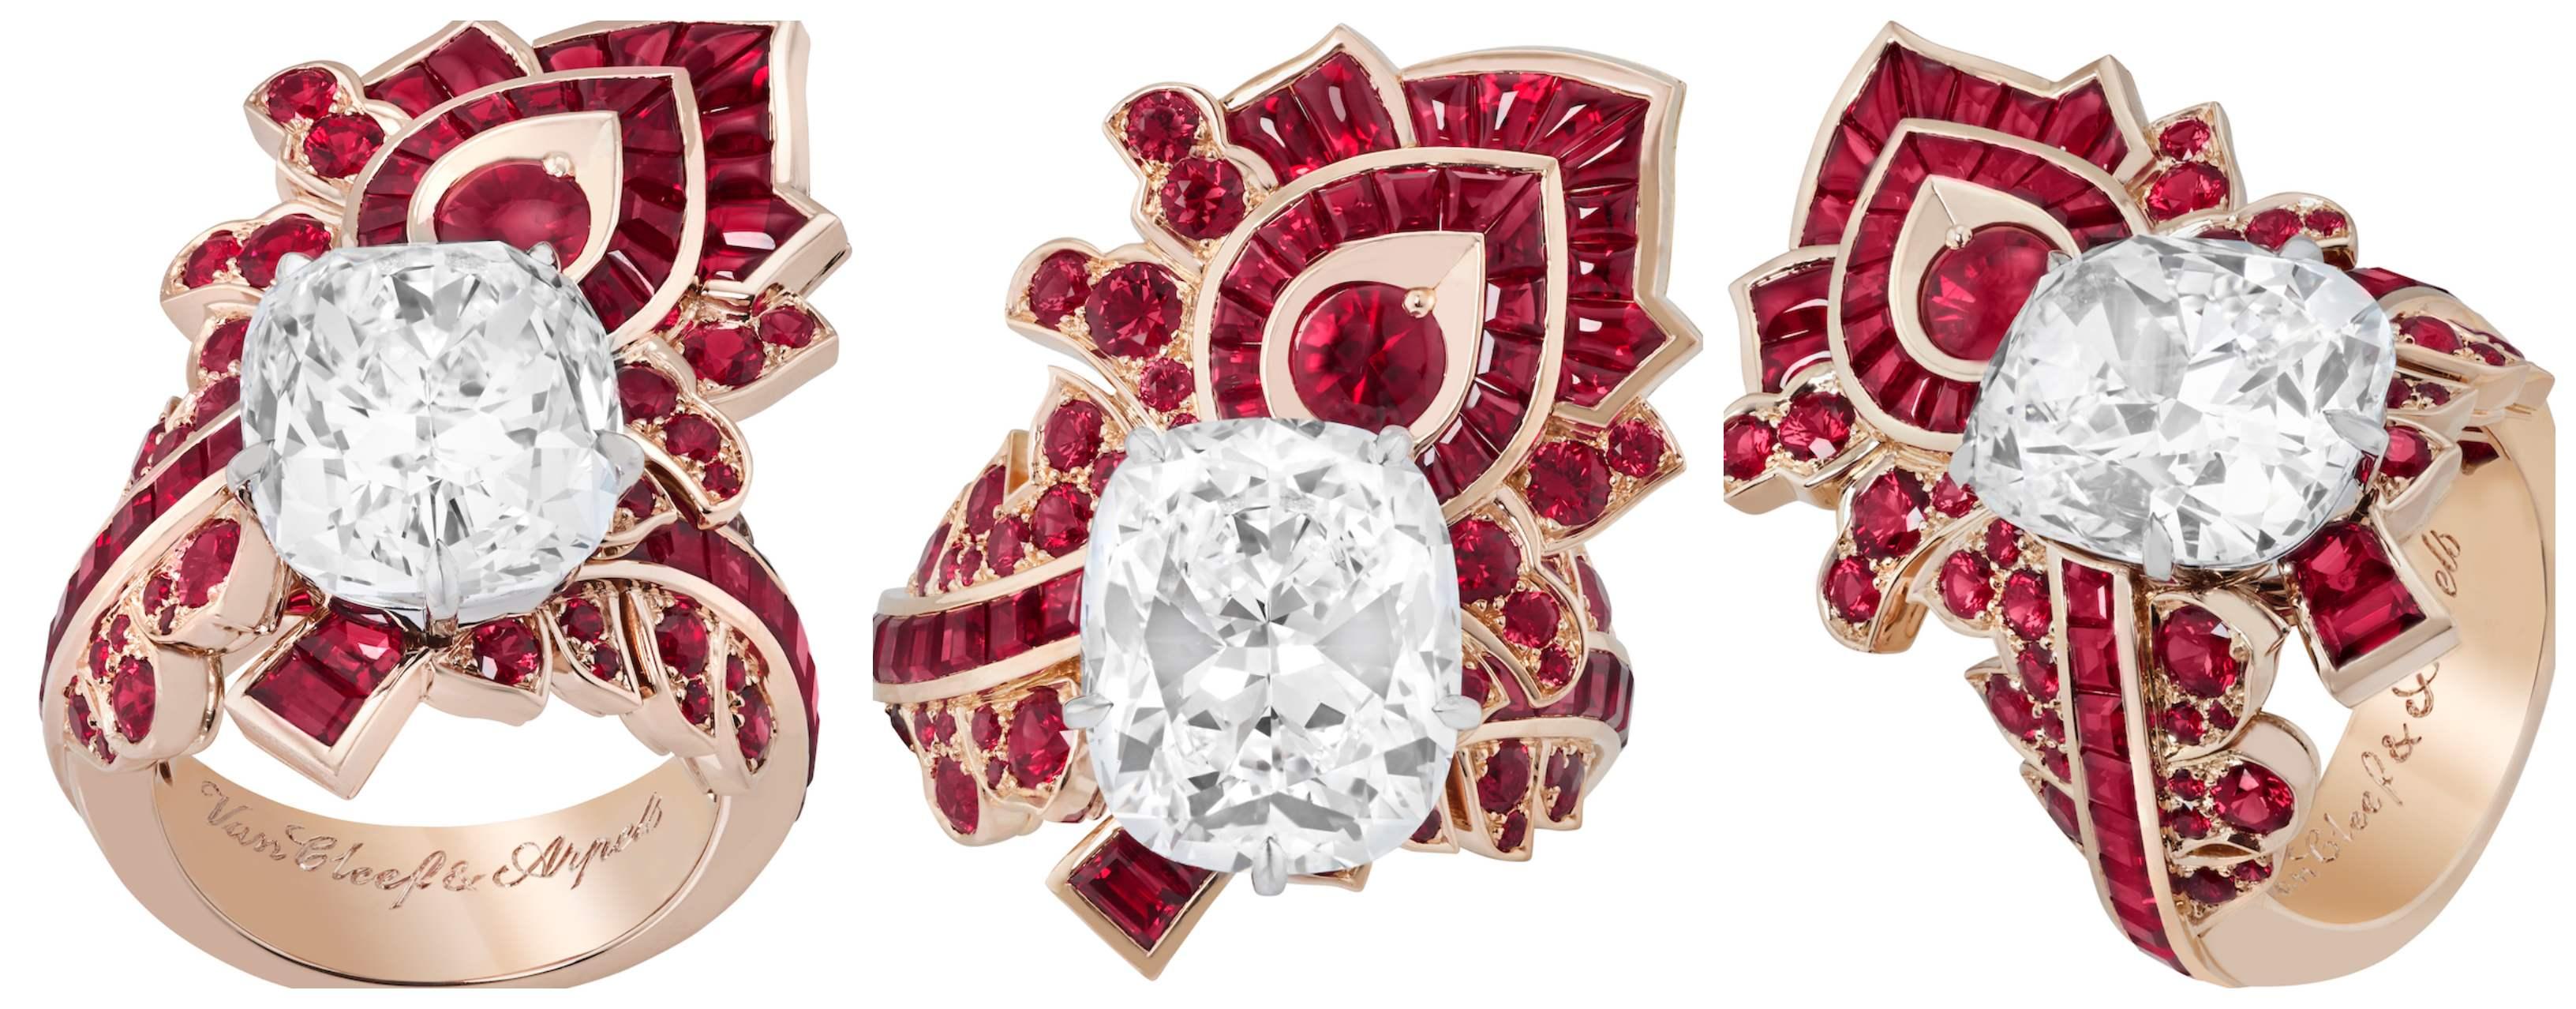 Feuille de rubis ring 2